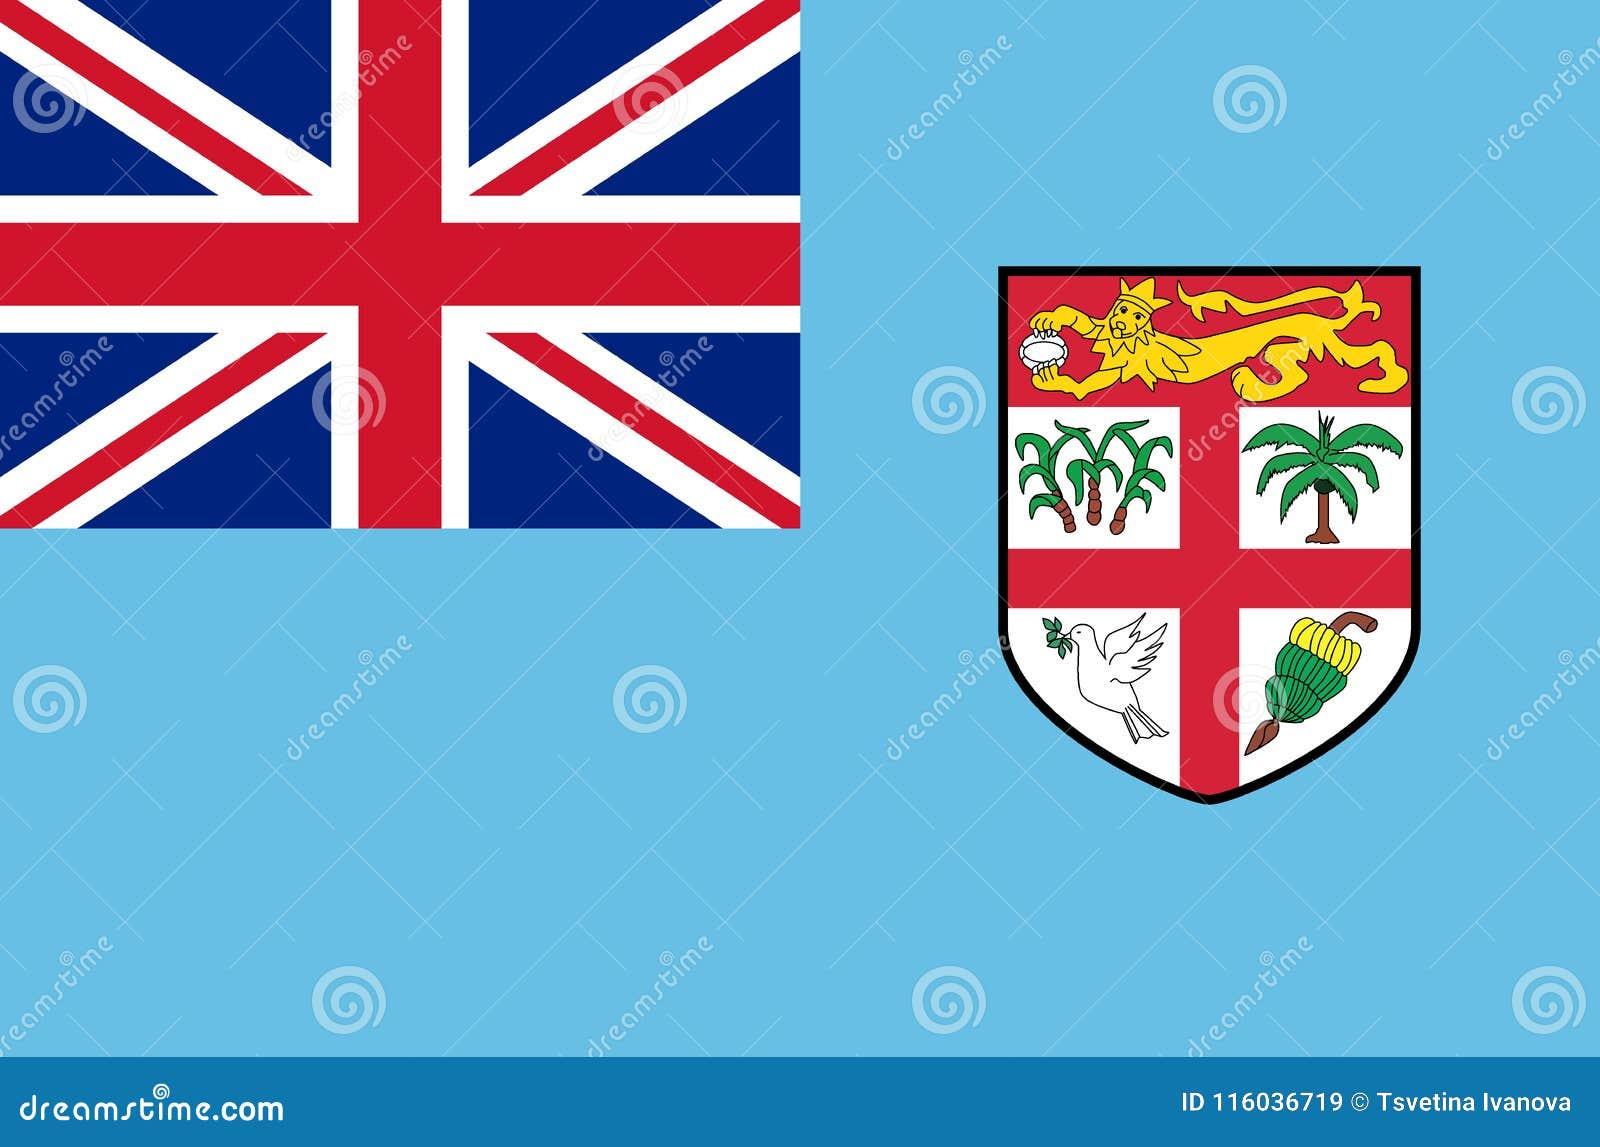 Флаг из цветов фото